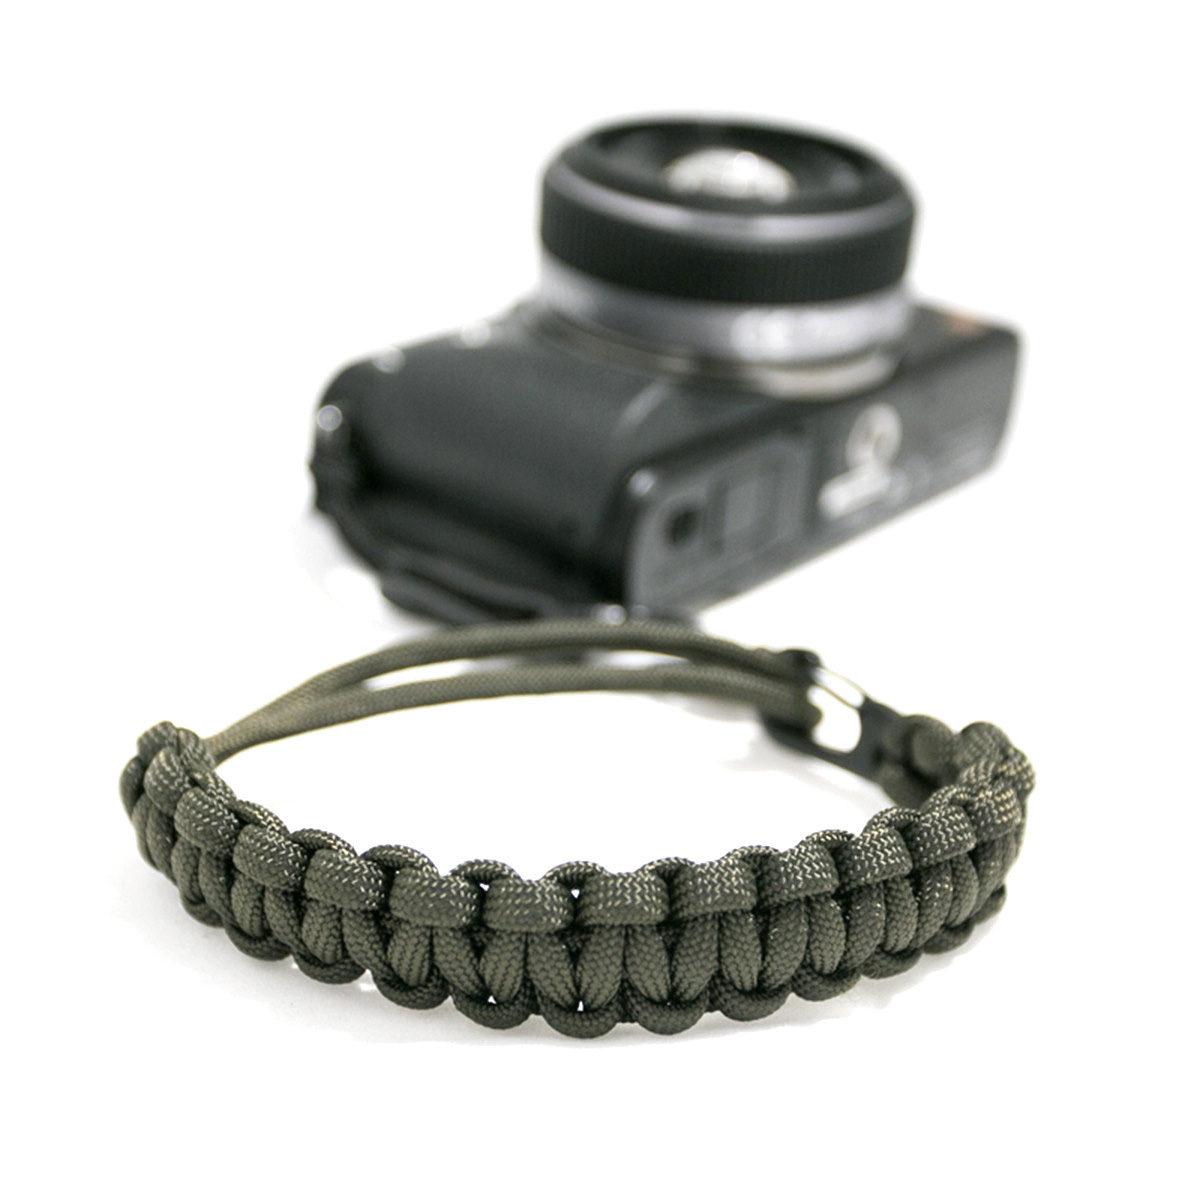 DSPTCH Camera Wrist Strap - Olive/Matte Black